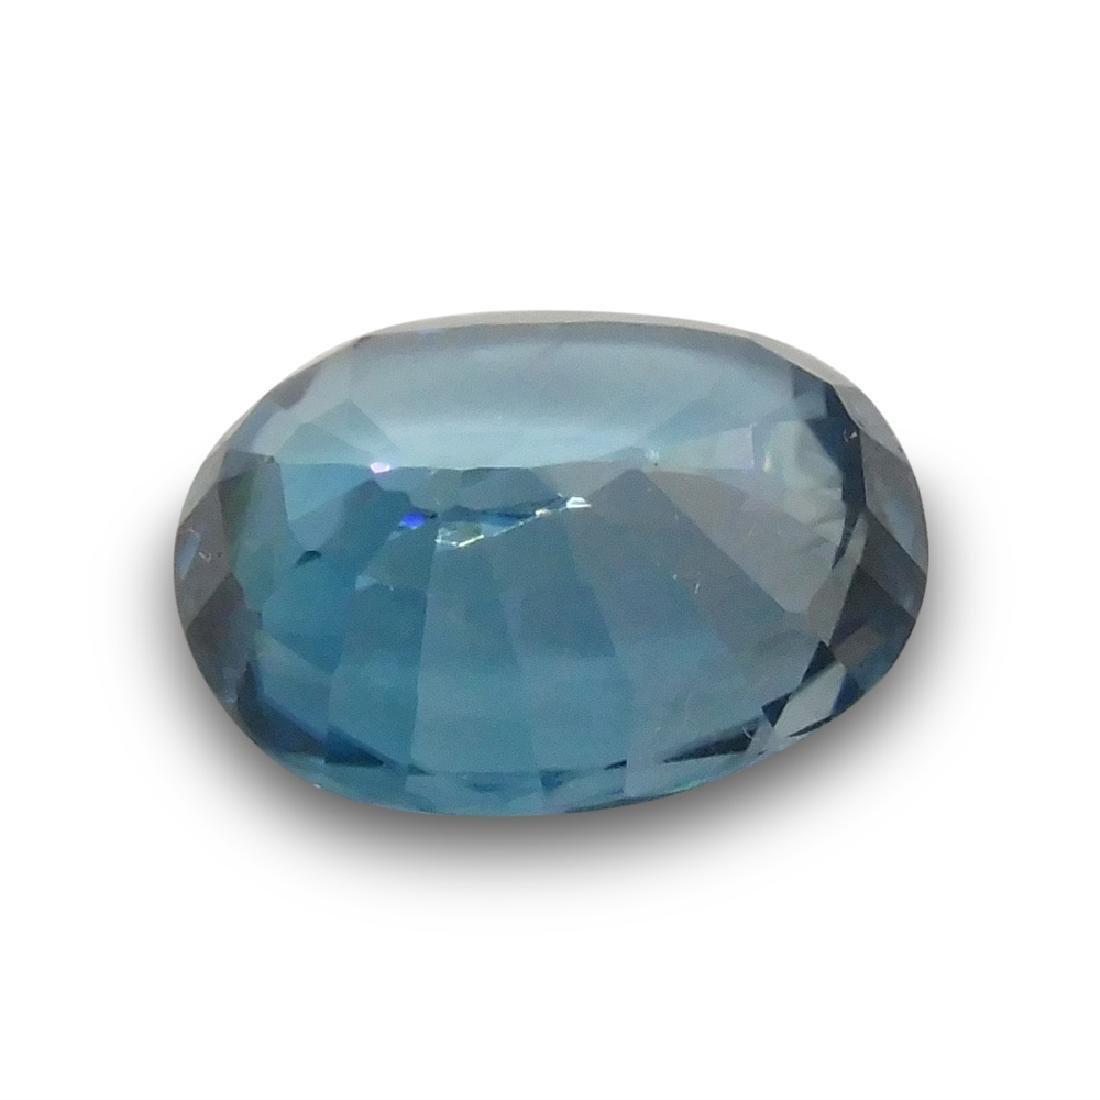 4.39 ct Oval Blue Zircon - 3